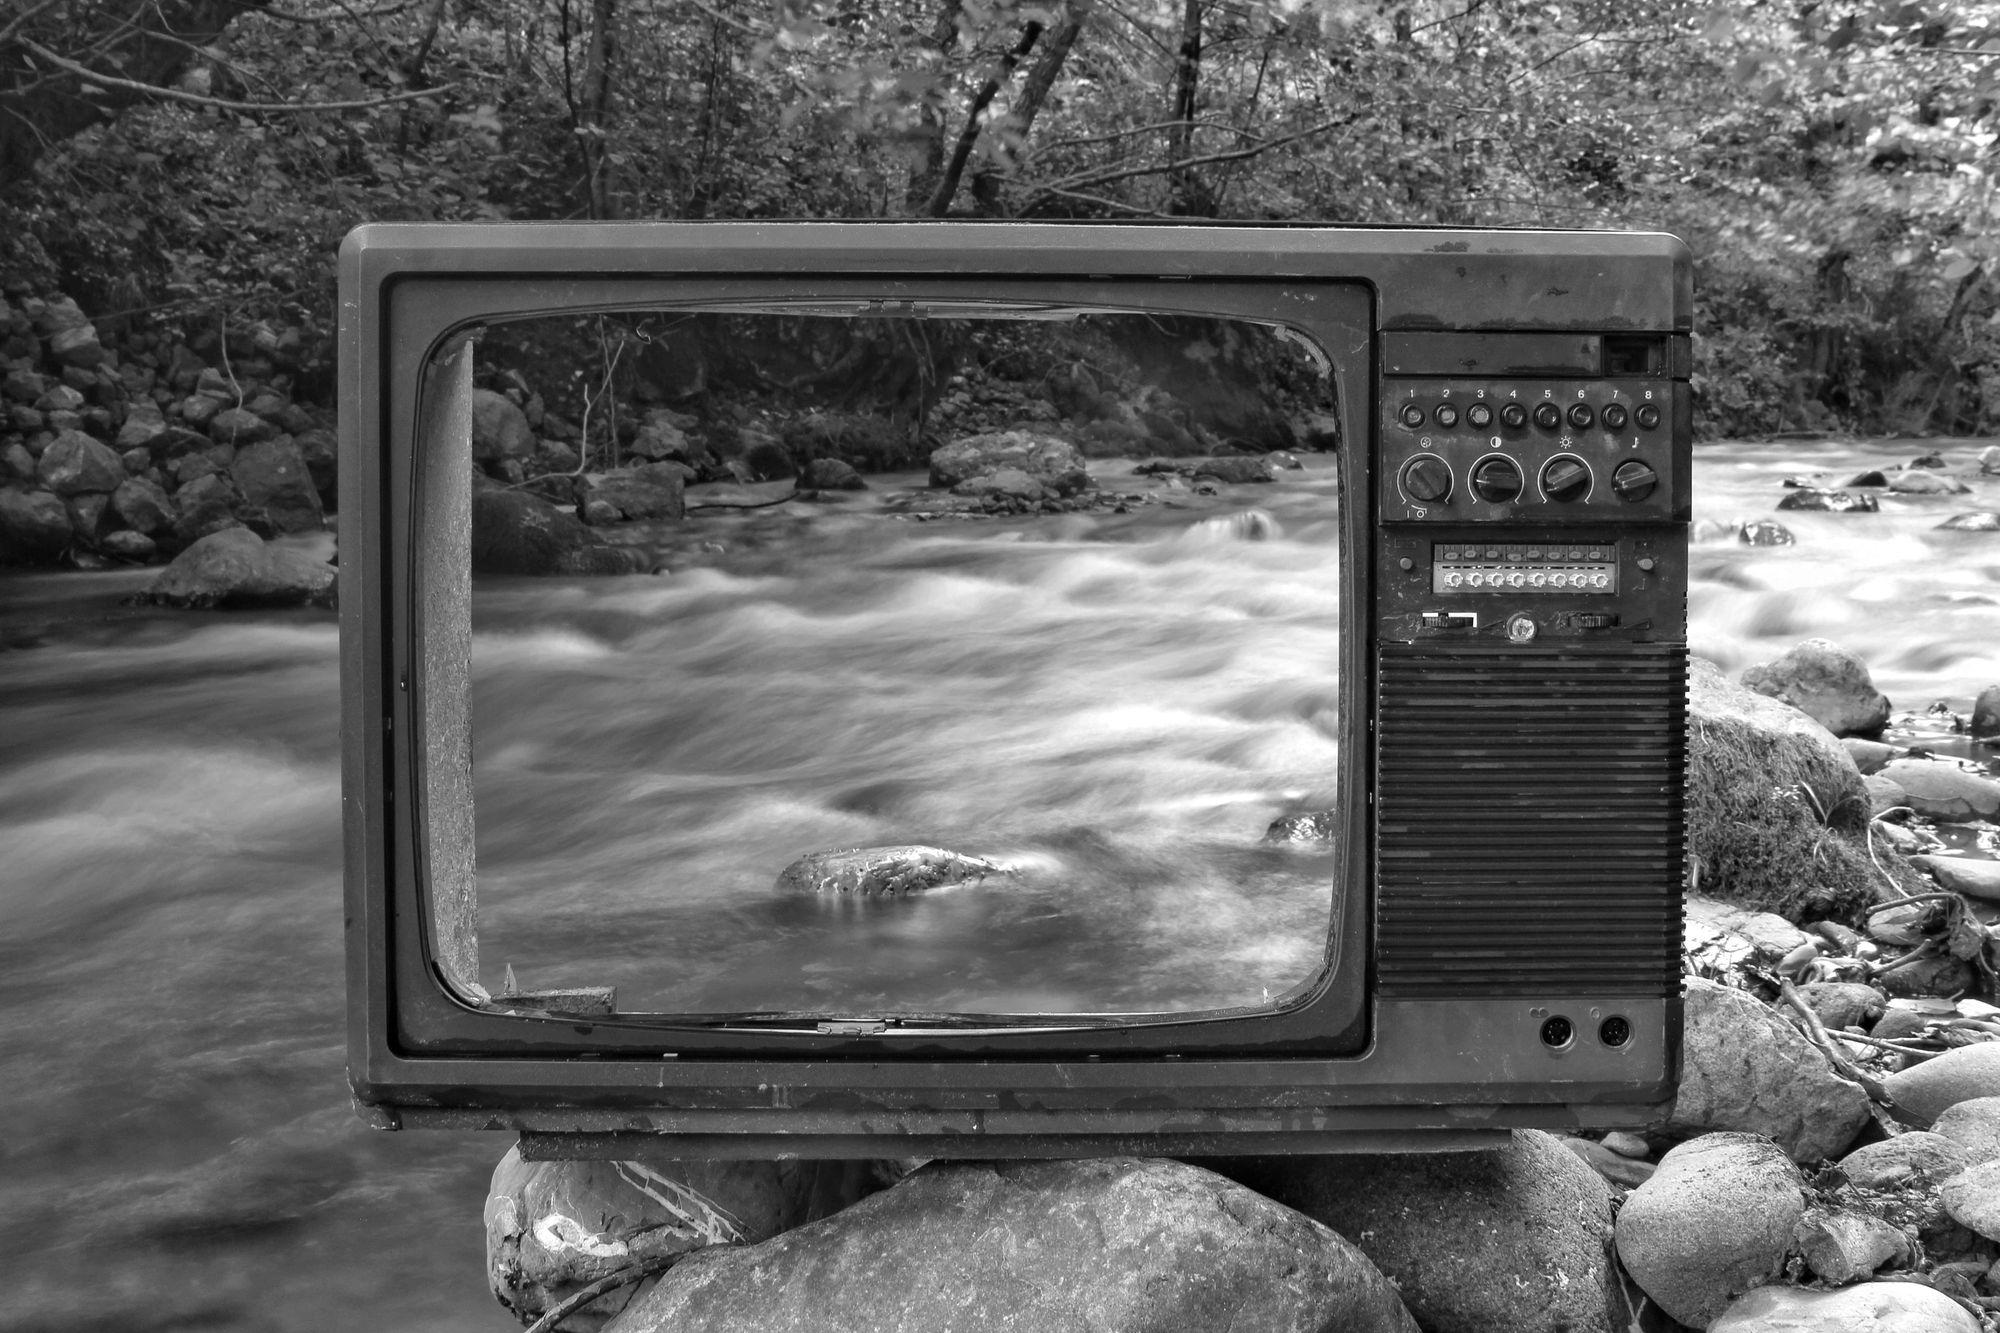 noir-tv-at-river